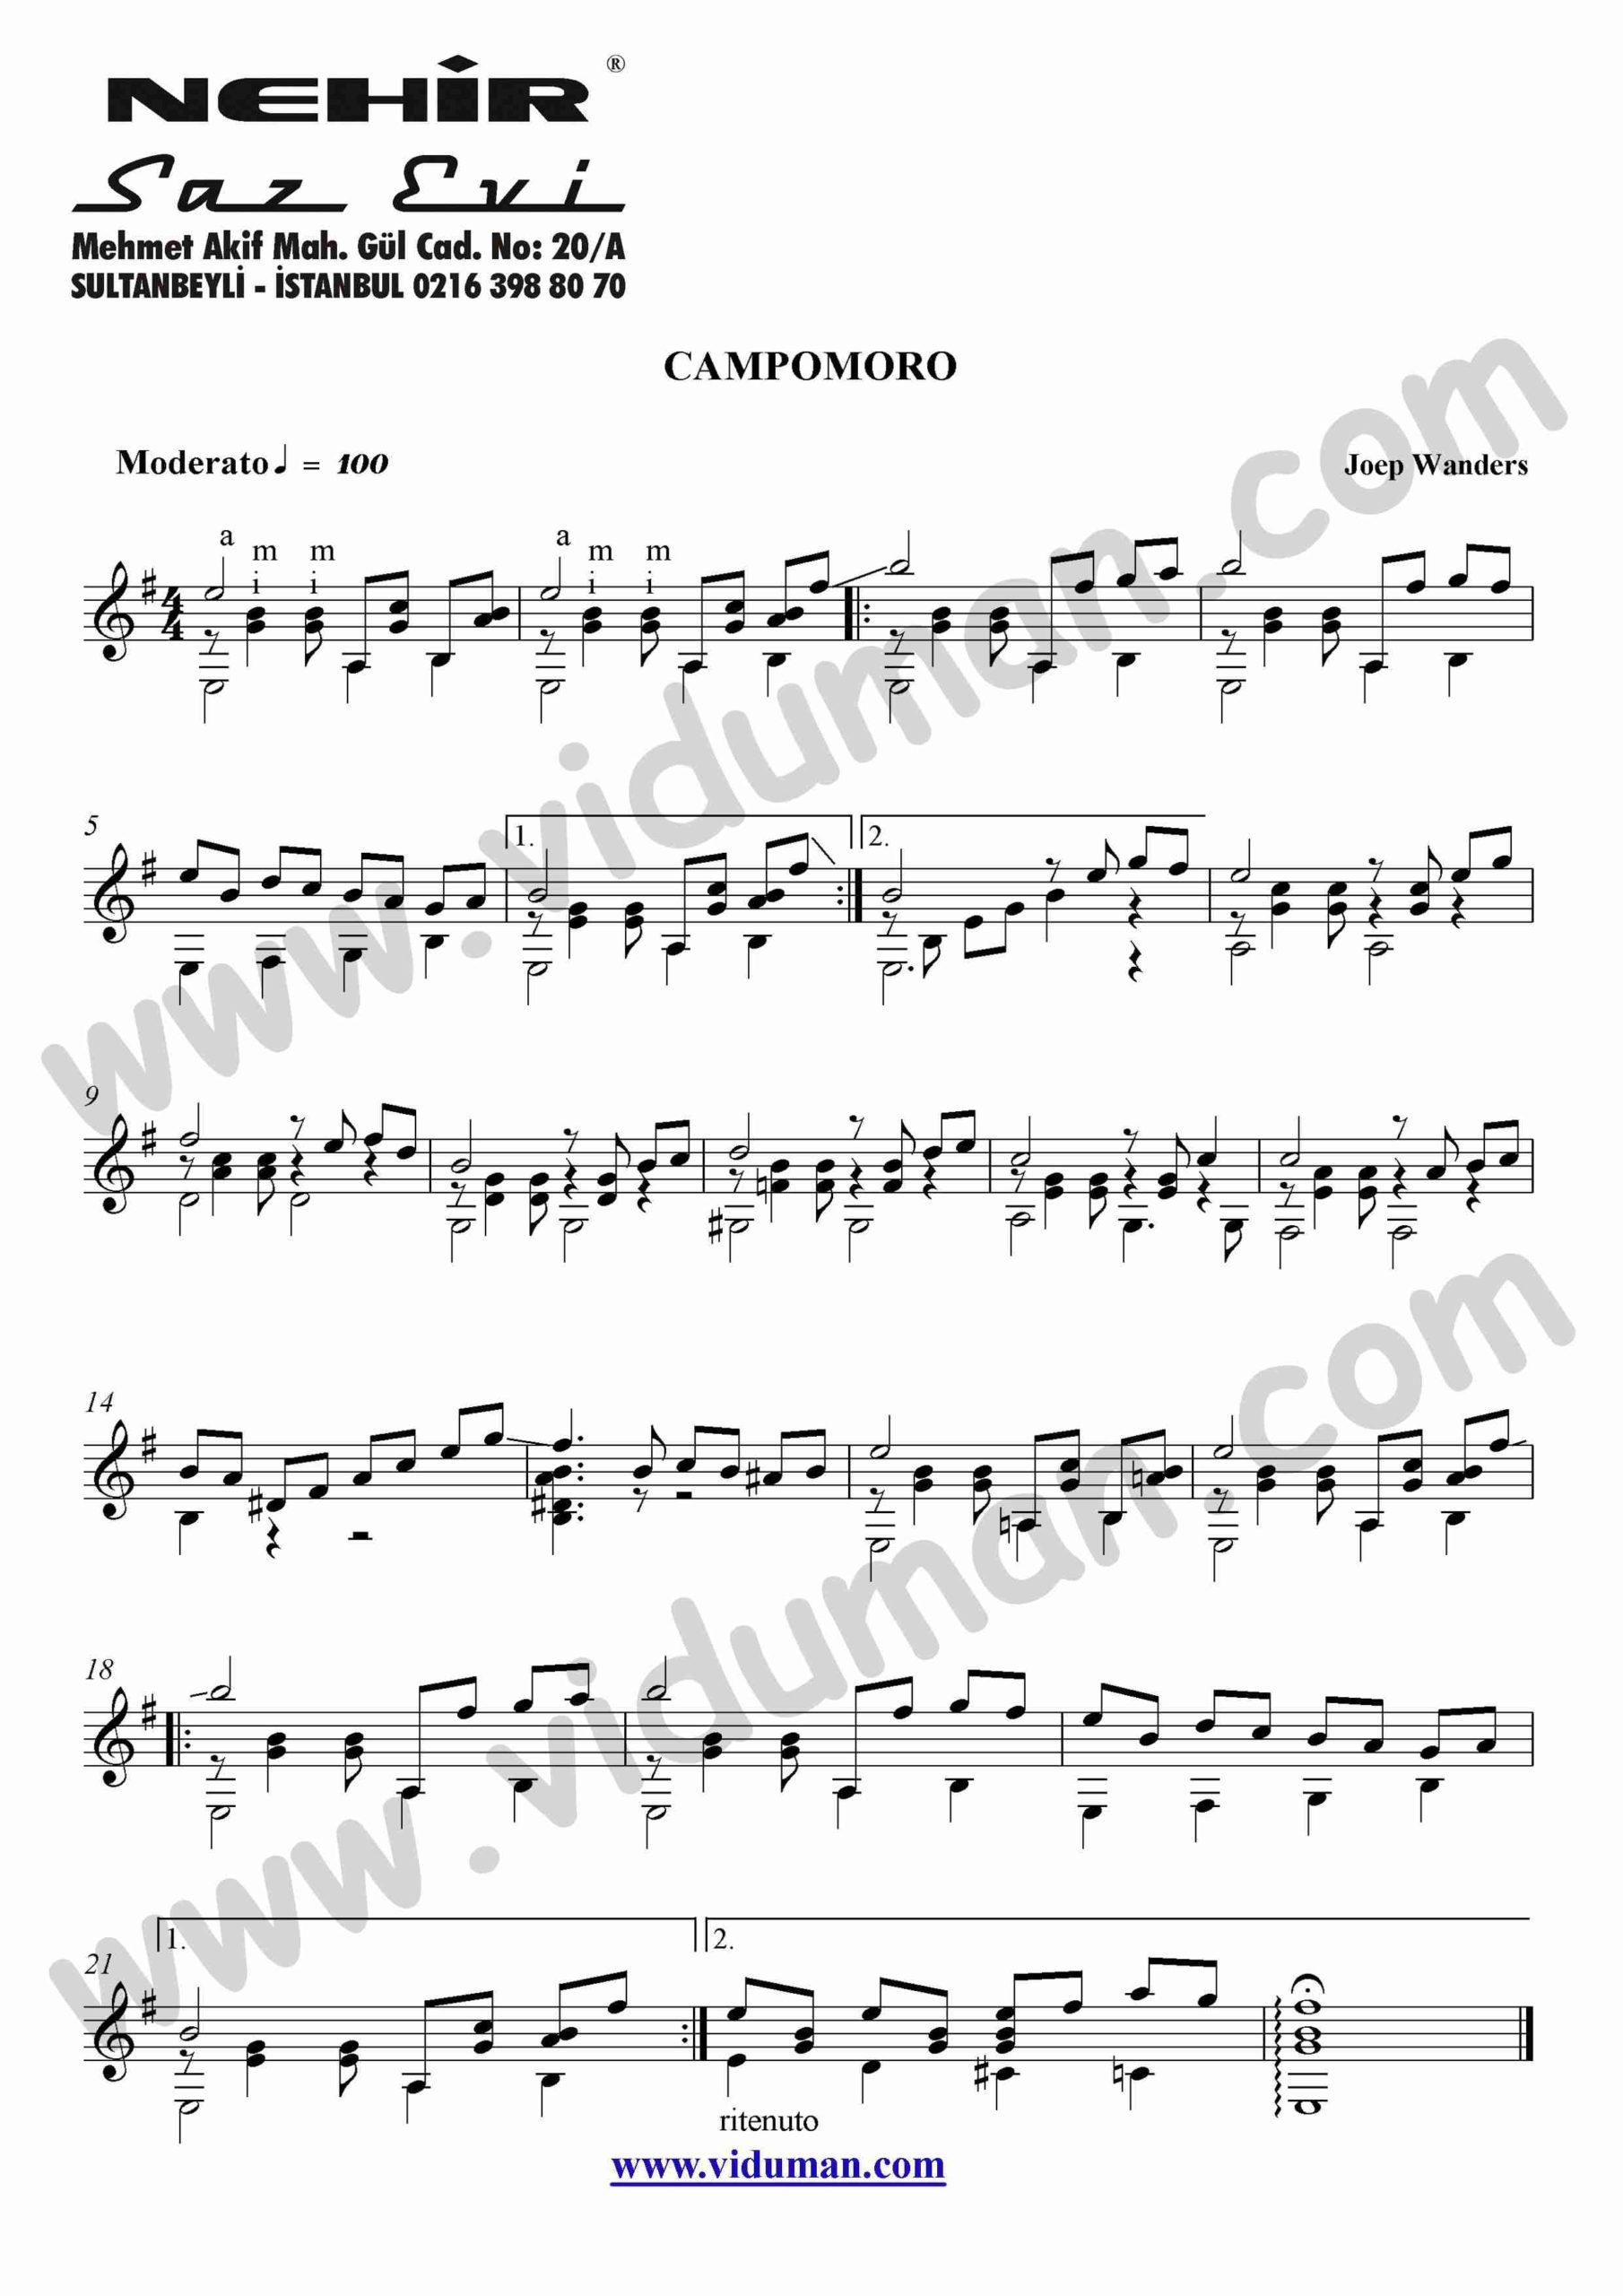 72- Campomoro (Joep Wanders)